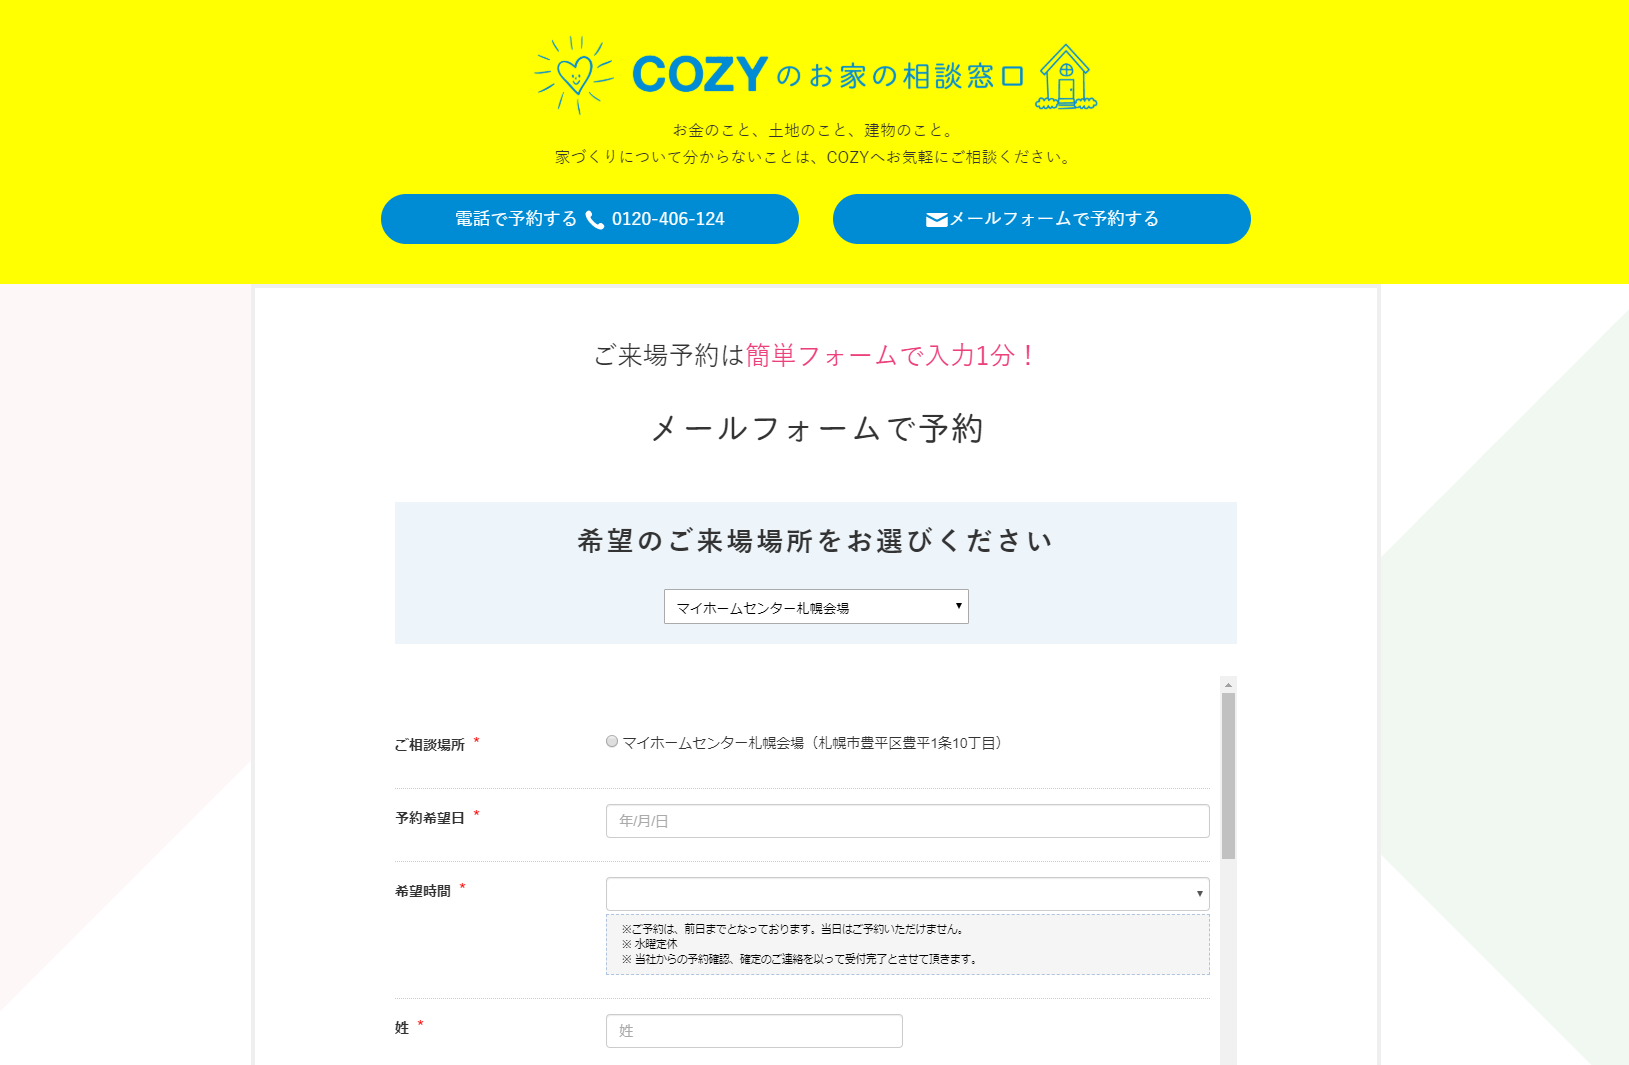 COZY見学予約サイト-パソコン画面3